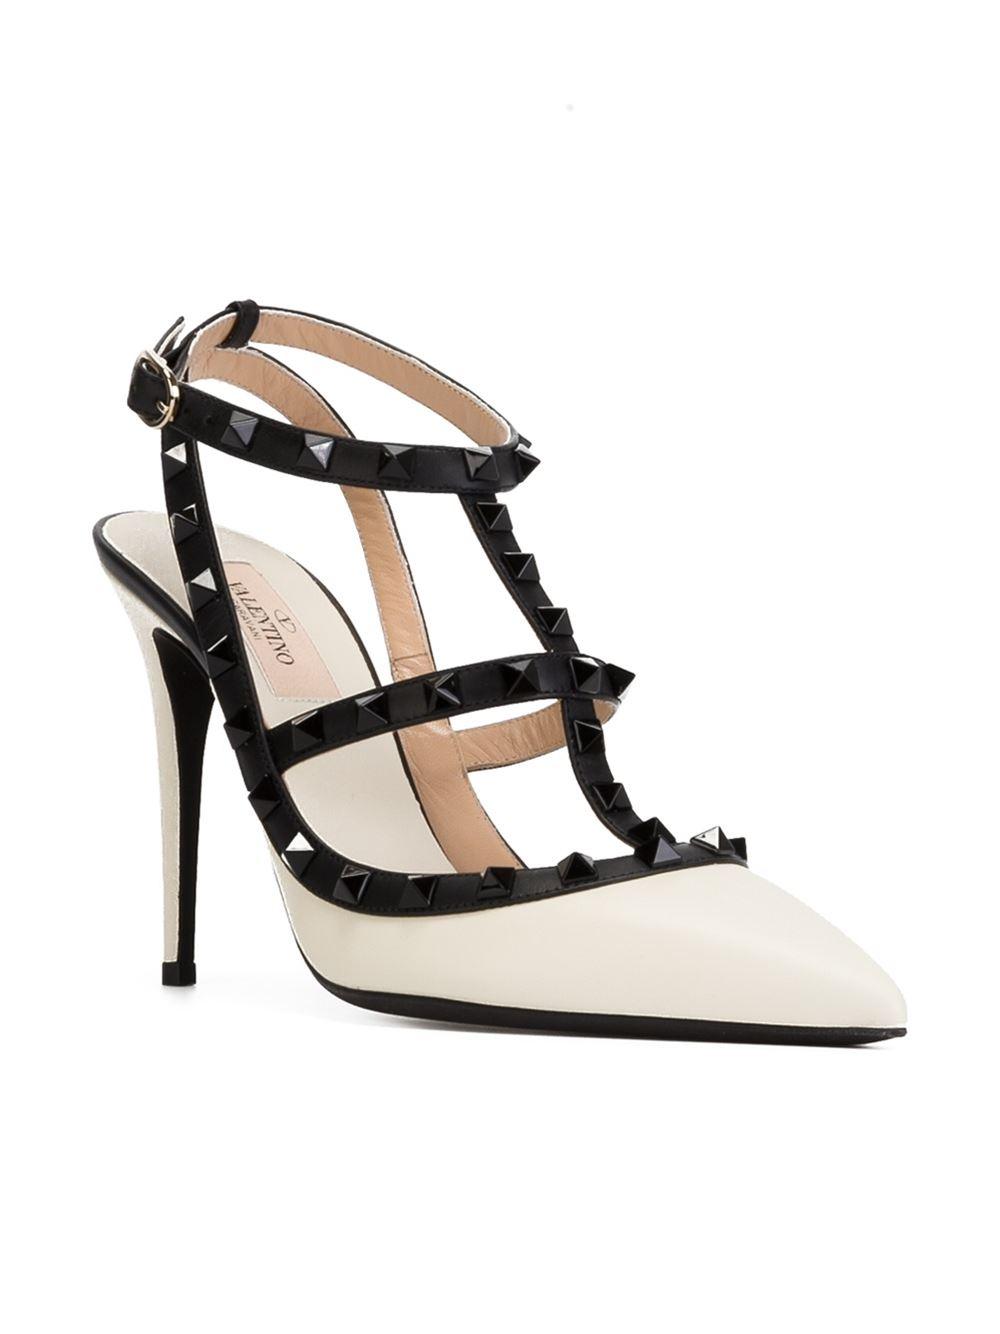 valentino_heels1.jpg